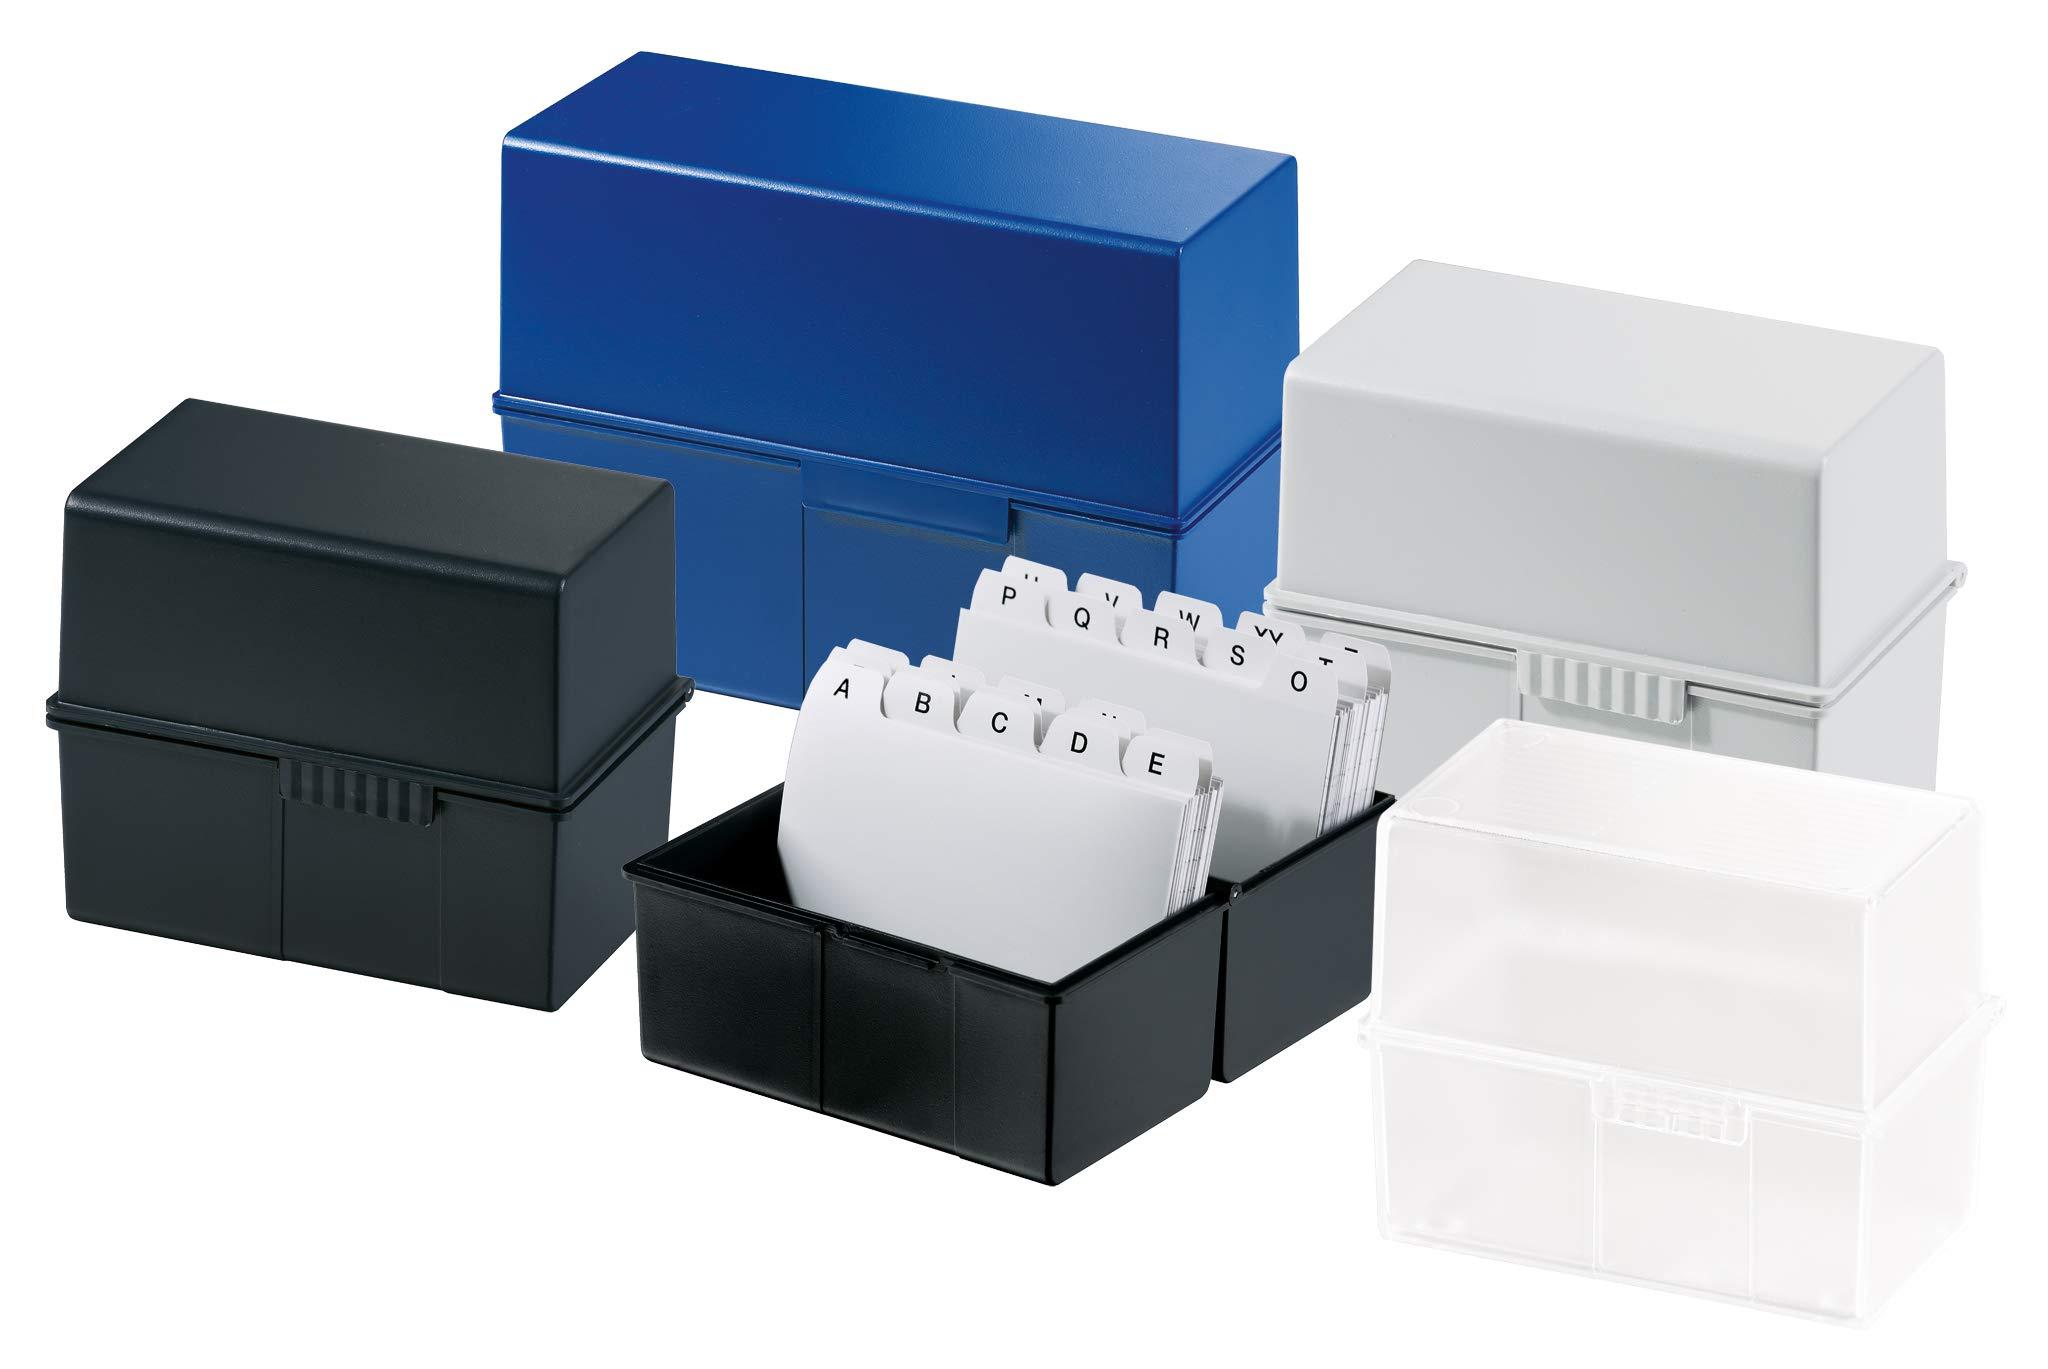 HAN-975-Karteibox-DIN-A5-quer-Innovatives-attraktives-Design-fr-450-Karten-mit-Stahlscharnier